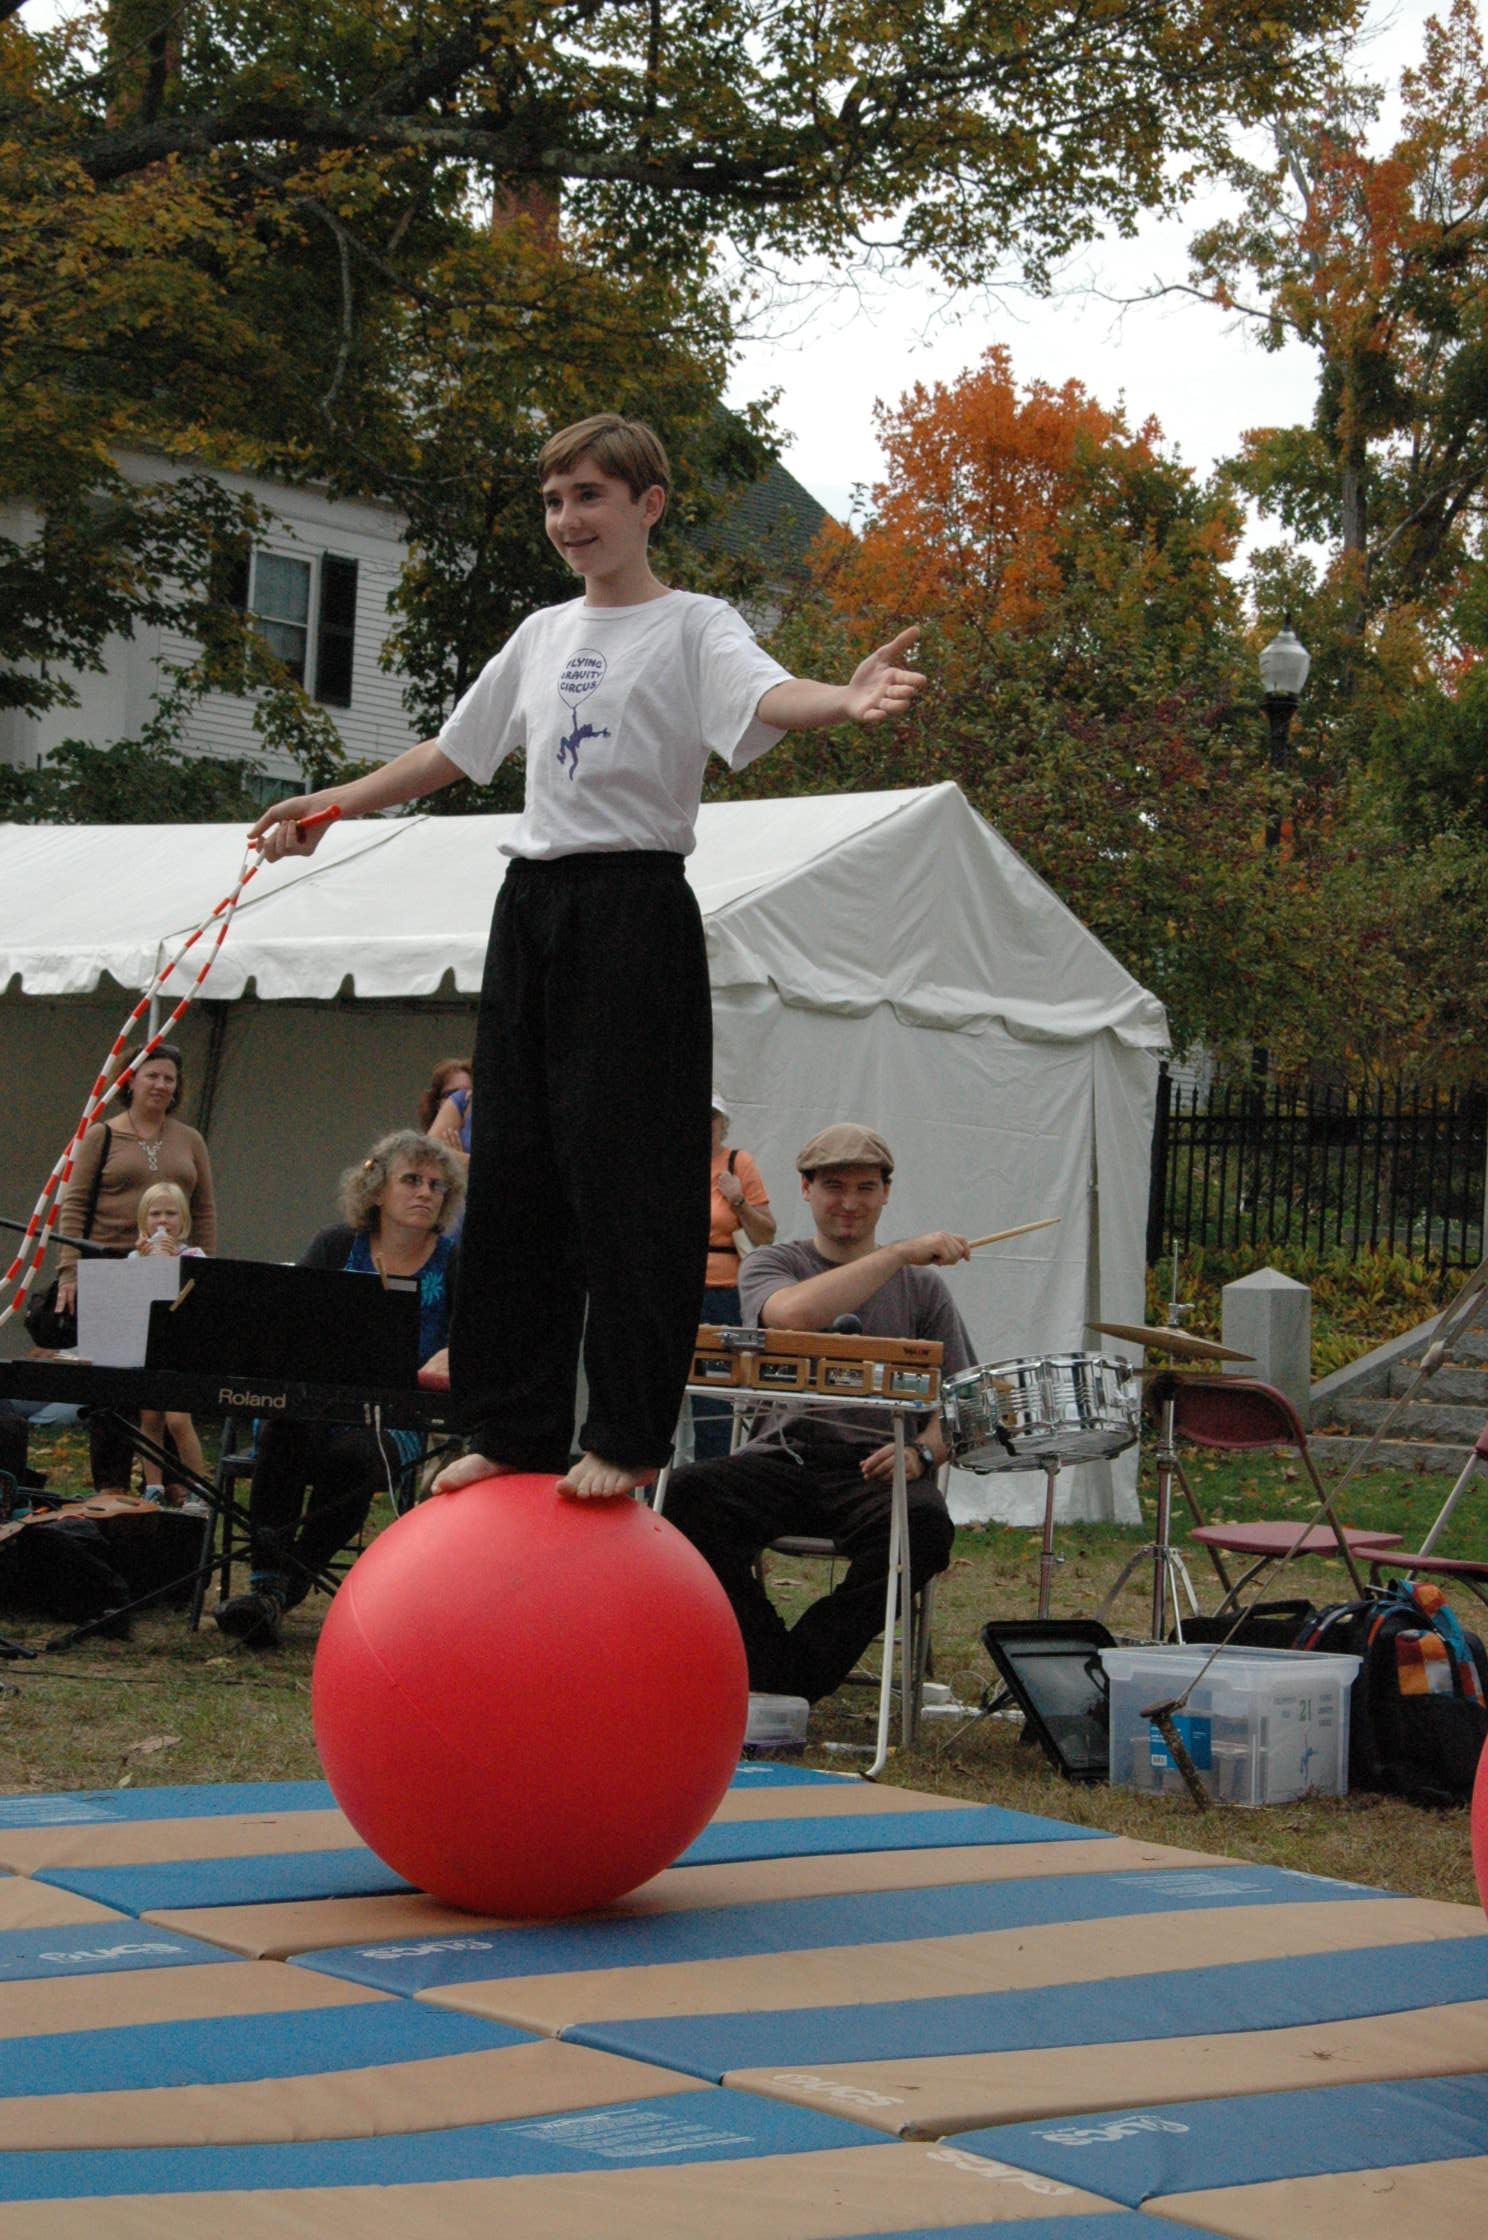 2012-10-06 Flyin Gravity Circus - Pumpkin 075.JPG